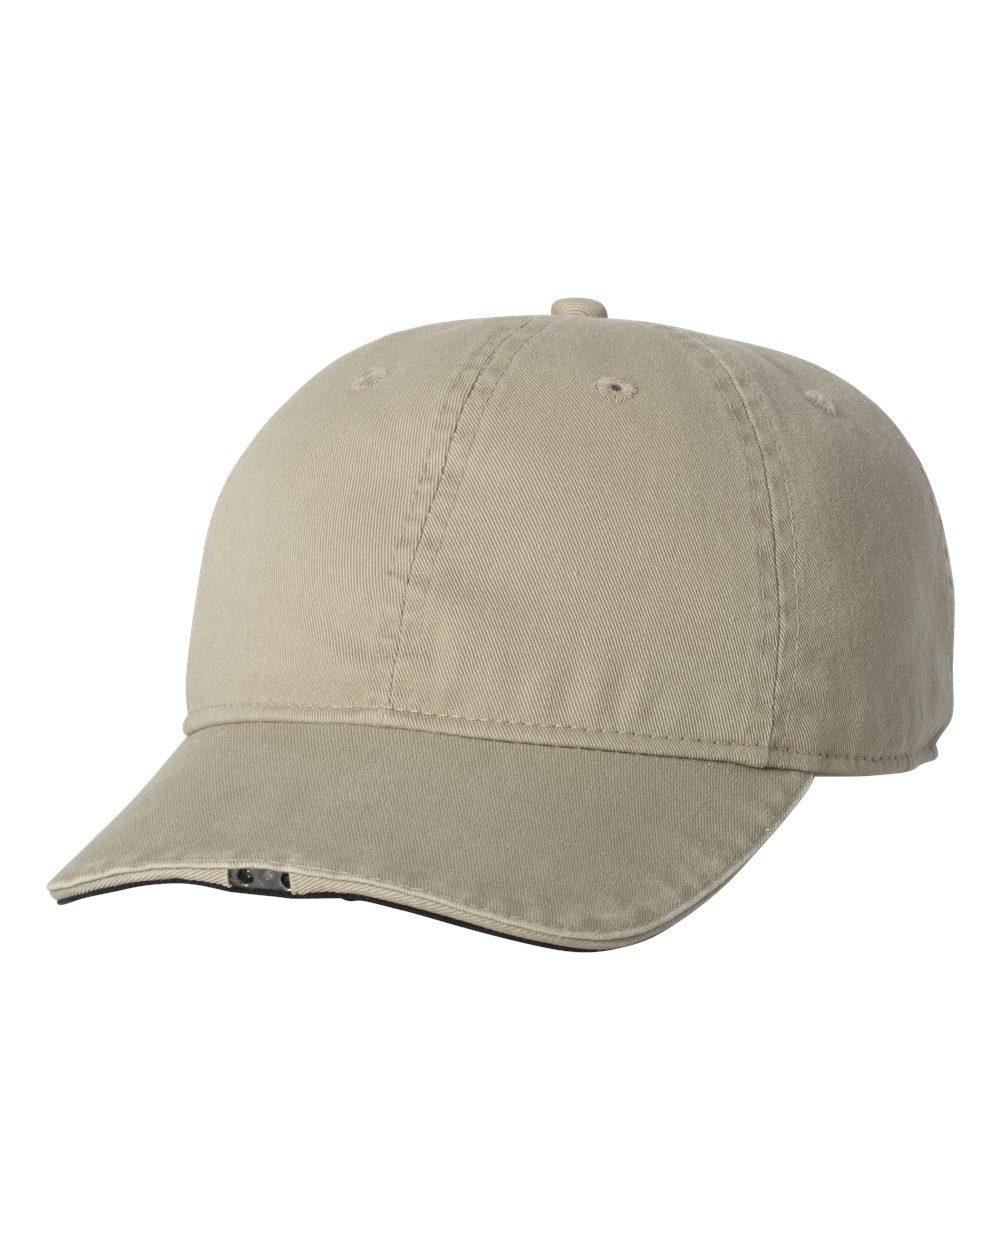 Outdoor Cap HIB652